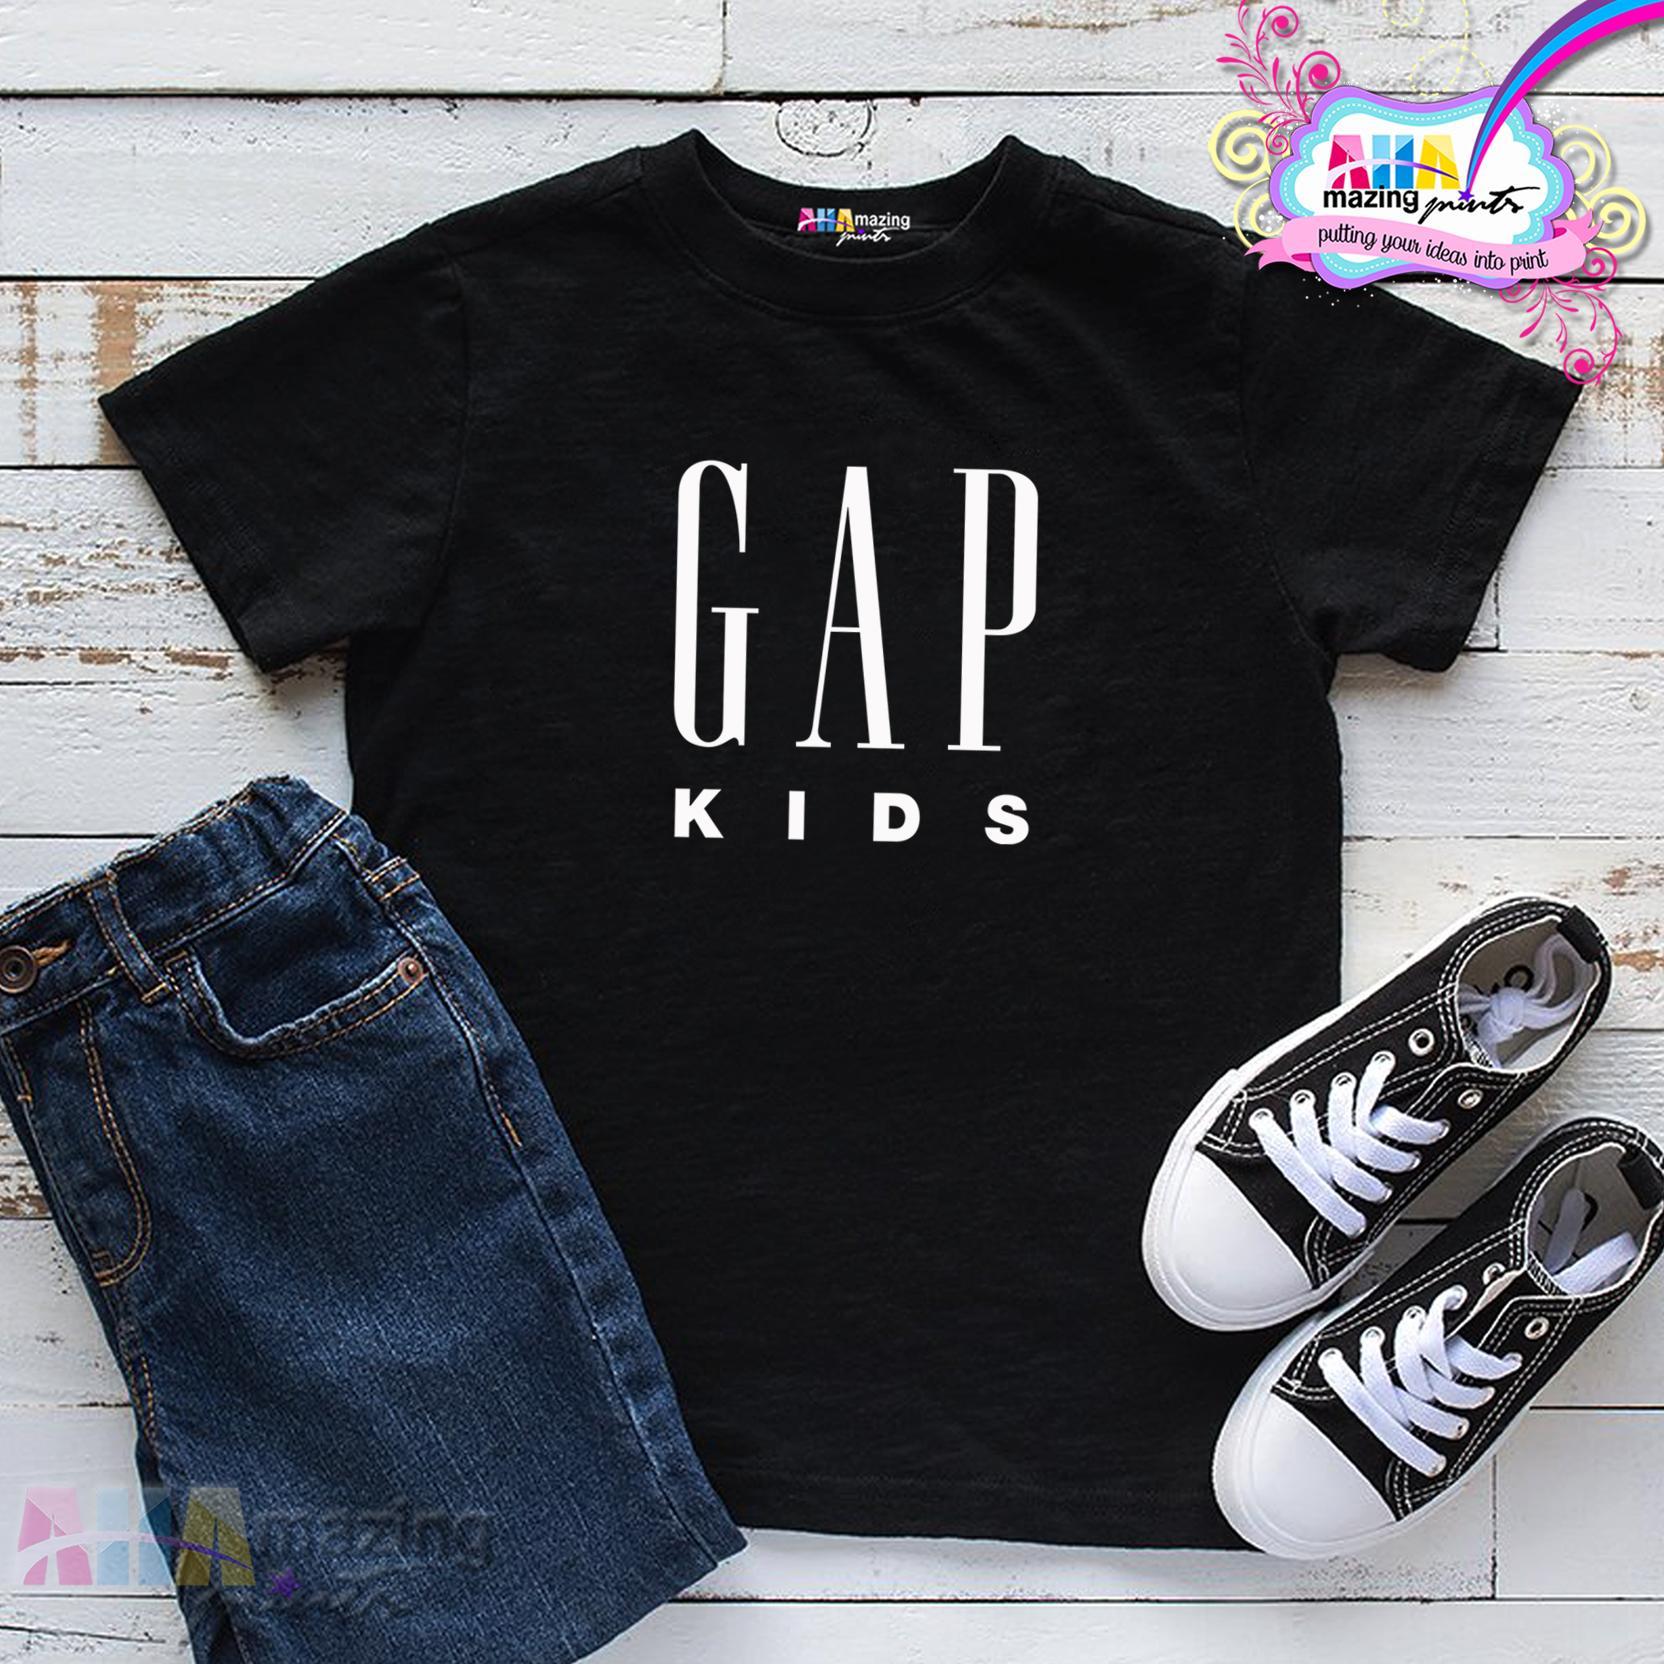 cb7bbf0788e2 KIDS SHIRT ❤ GAP KIDS T-SHIRT ❤ Kids Fashion Top Boys Little Boys Statement